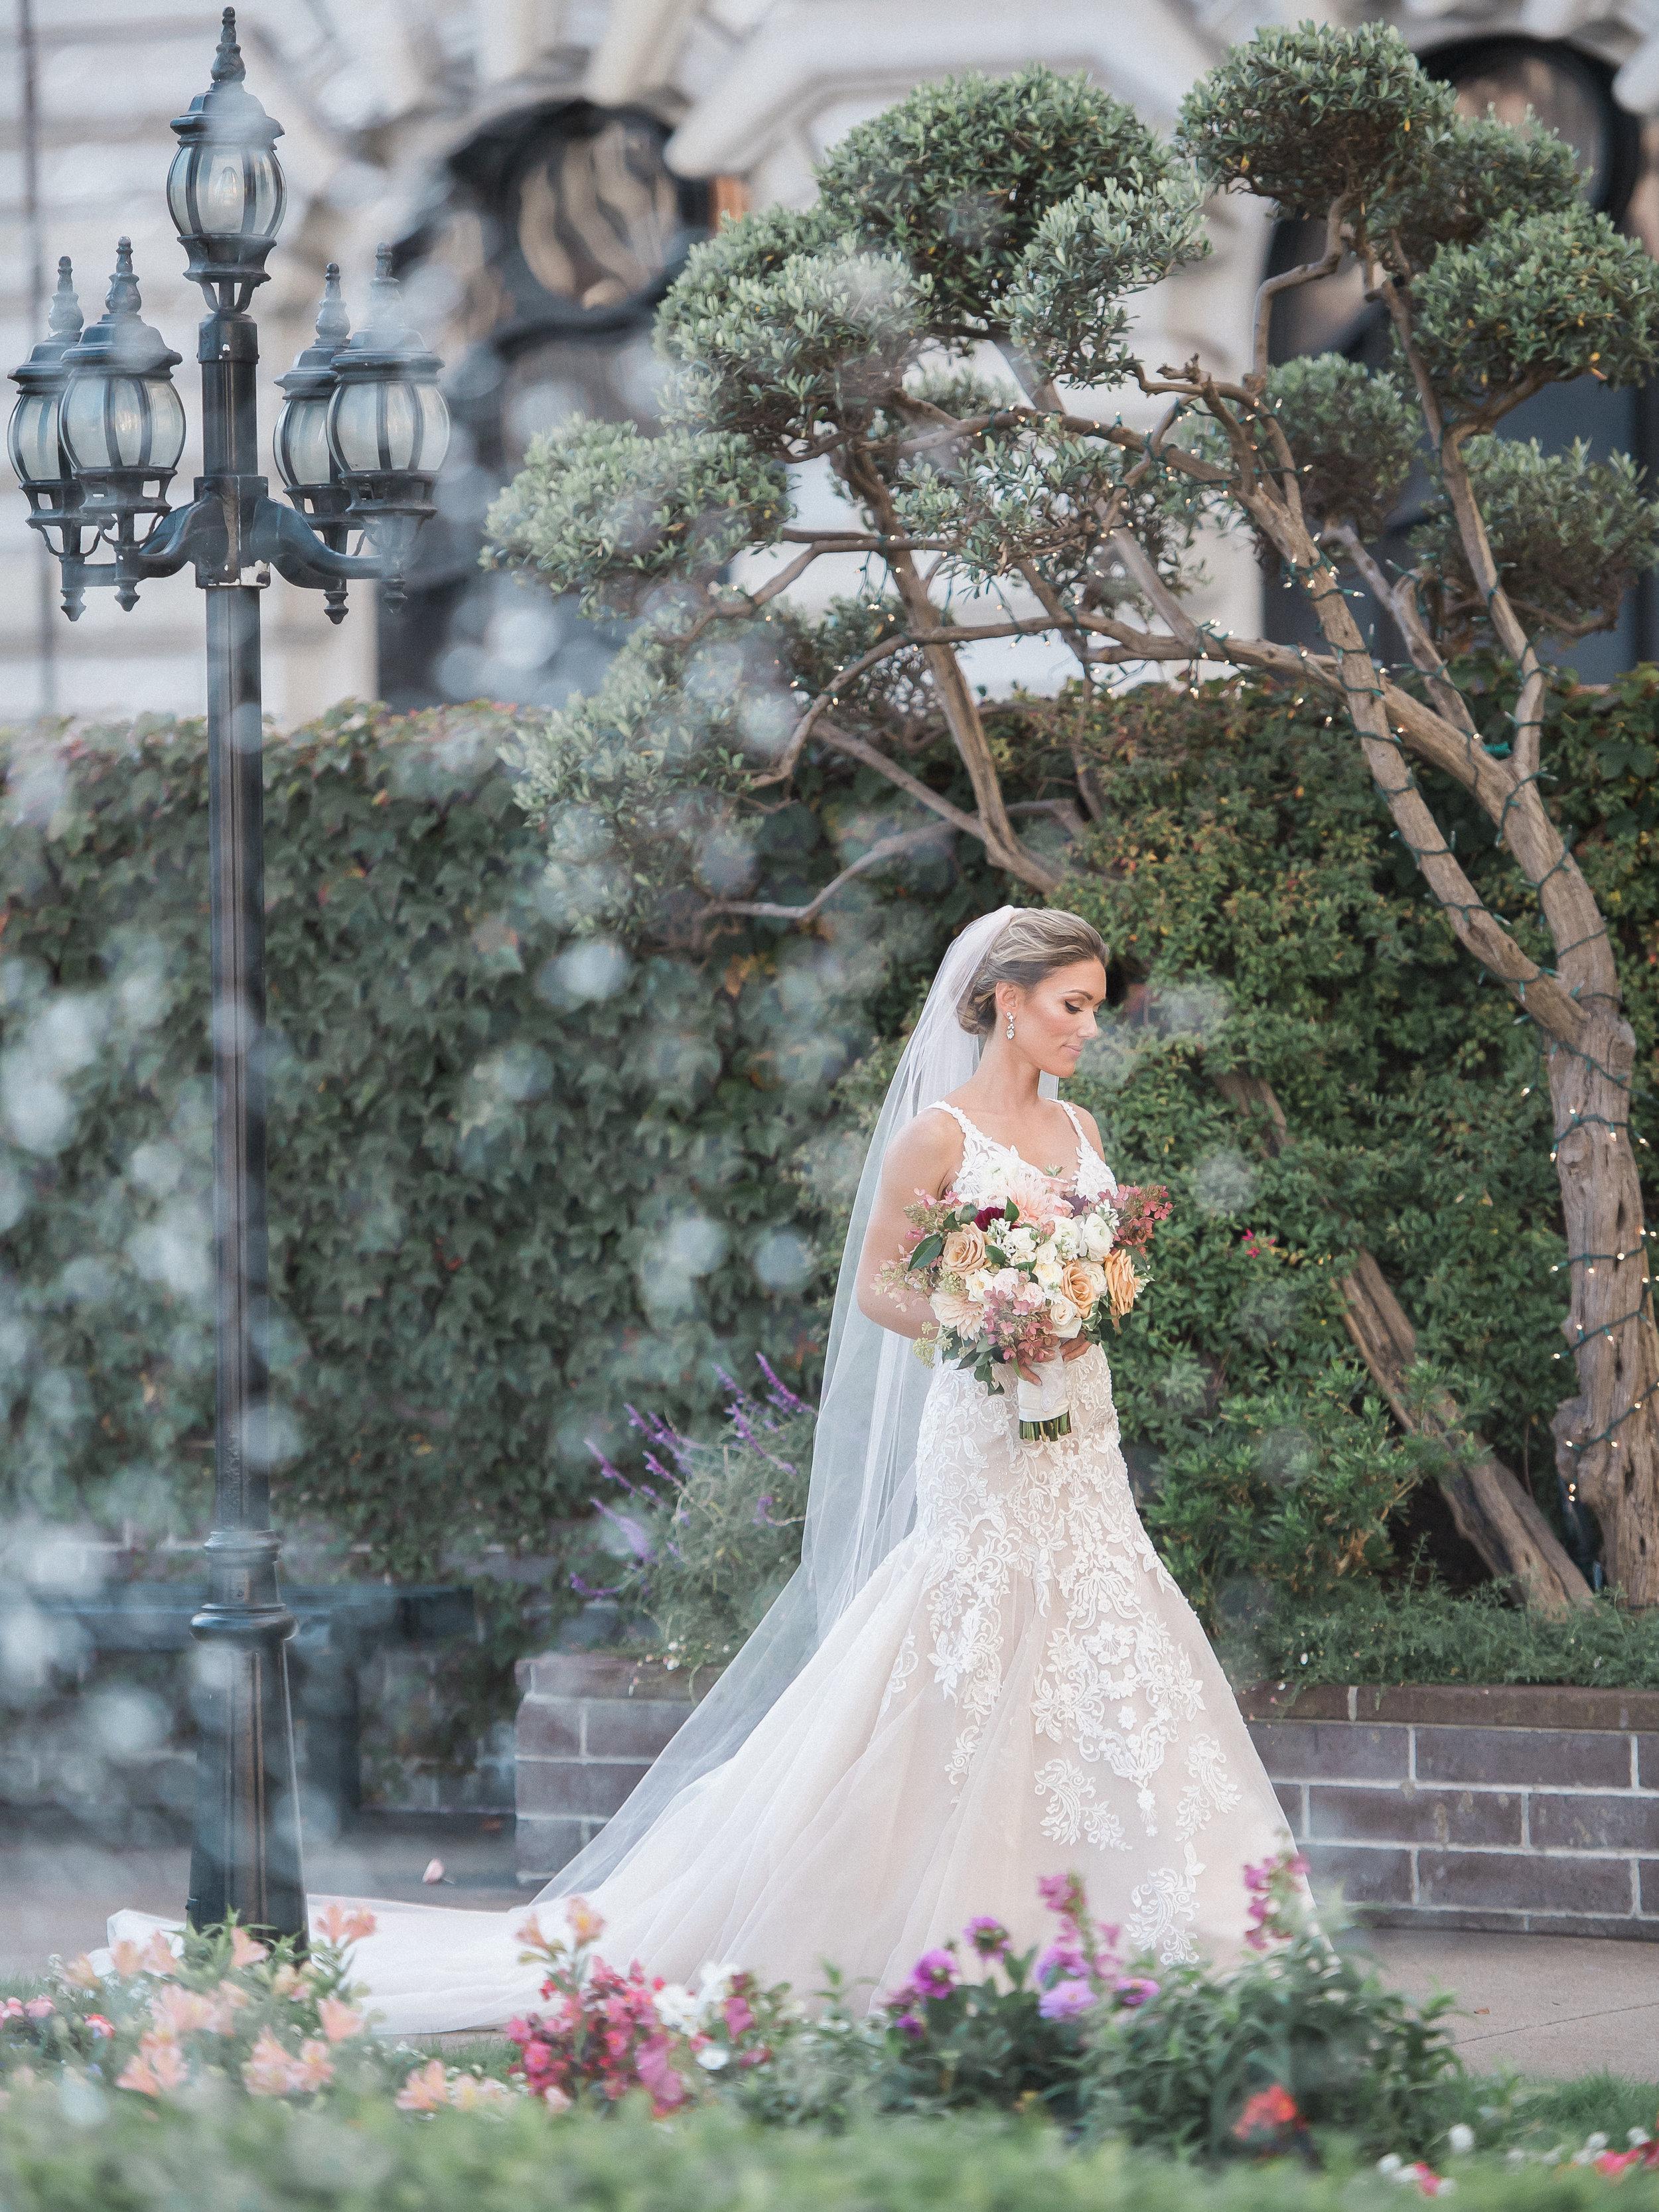 Katie+Nick_wedding_spp-blog-61.jpg